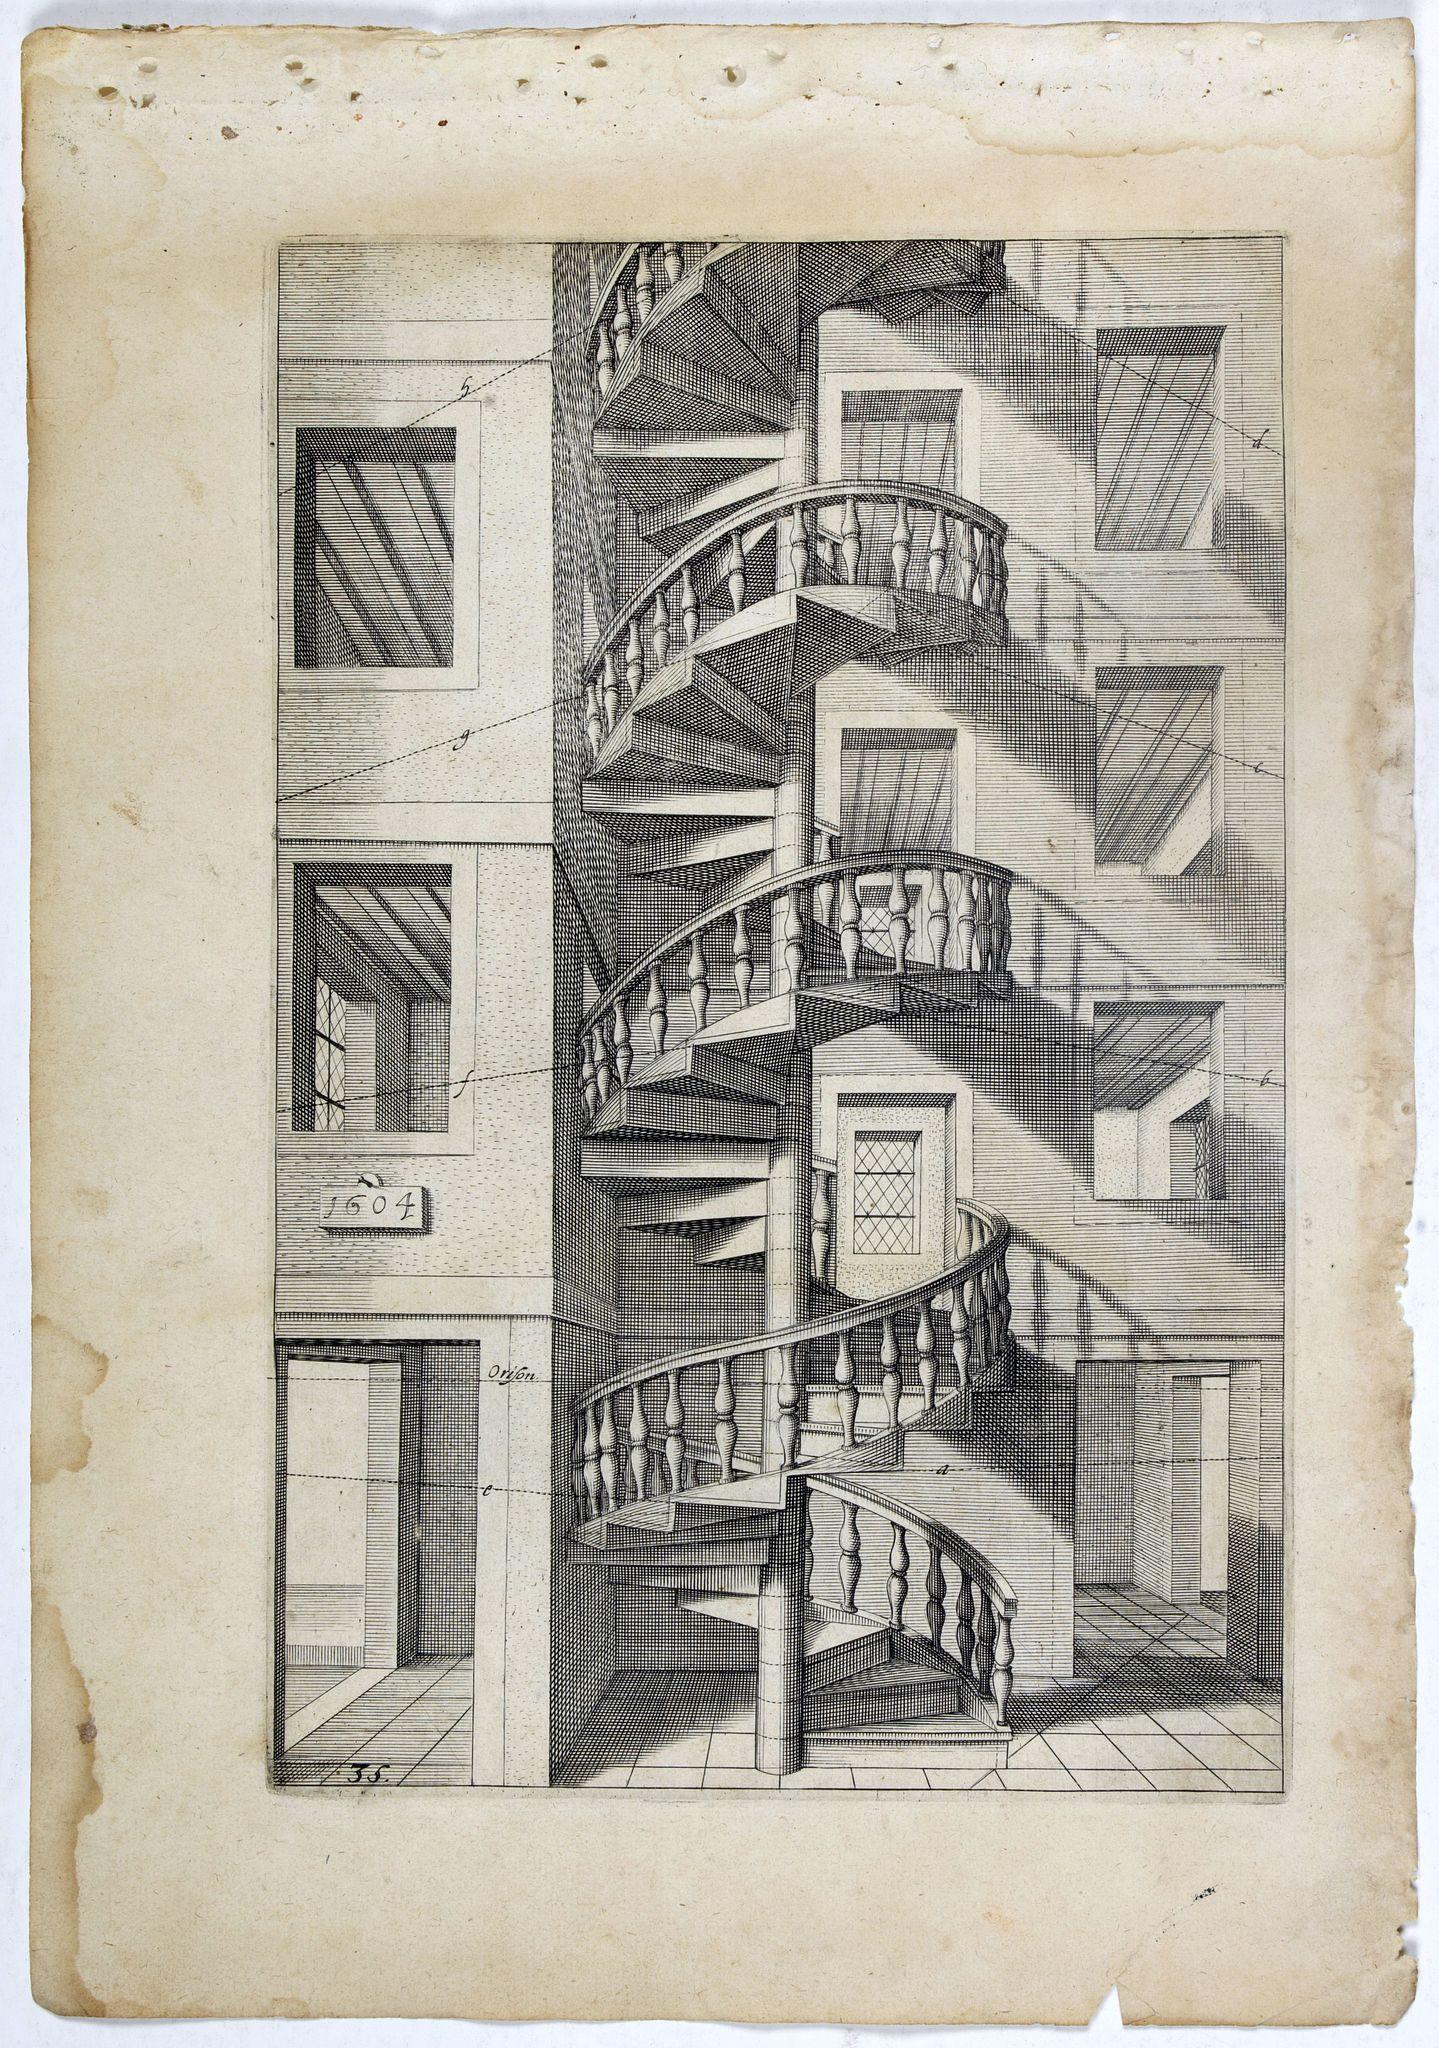 VREDEMAN DE VRIES, J. / HONDIUS, H. -  Perspective print by Vredeman de Vries. 35.